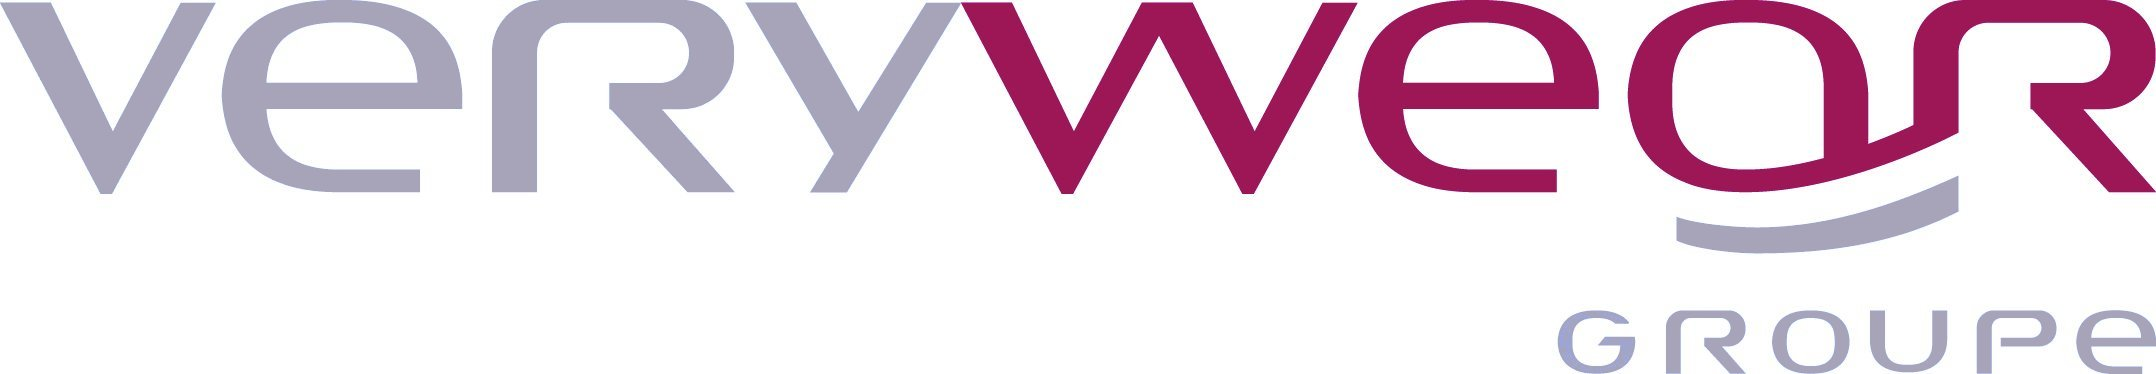 logo verywear